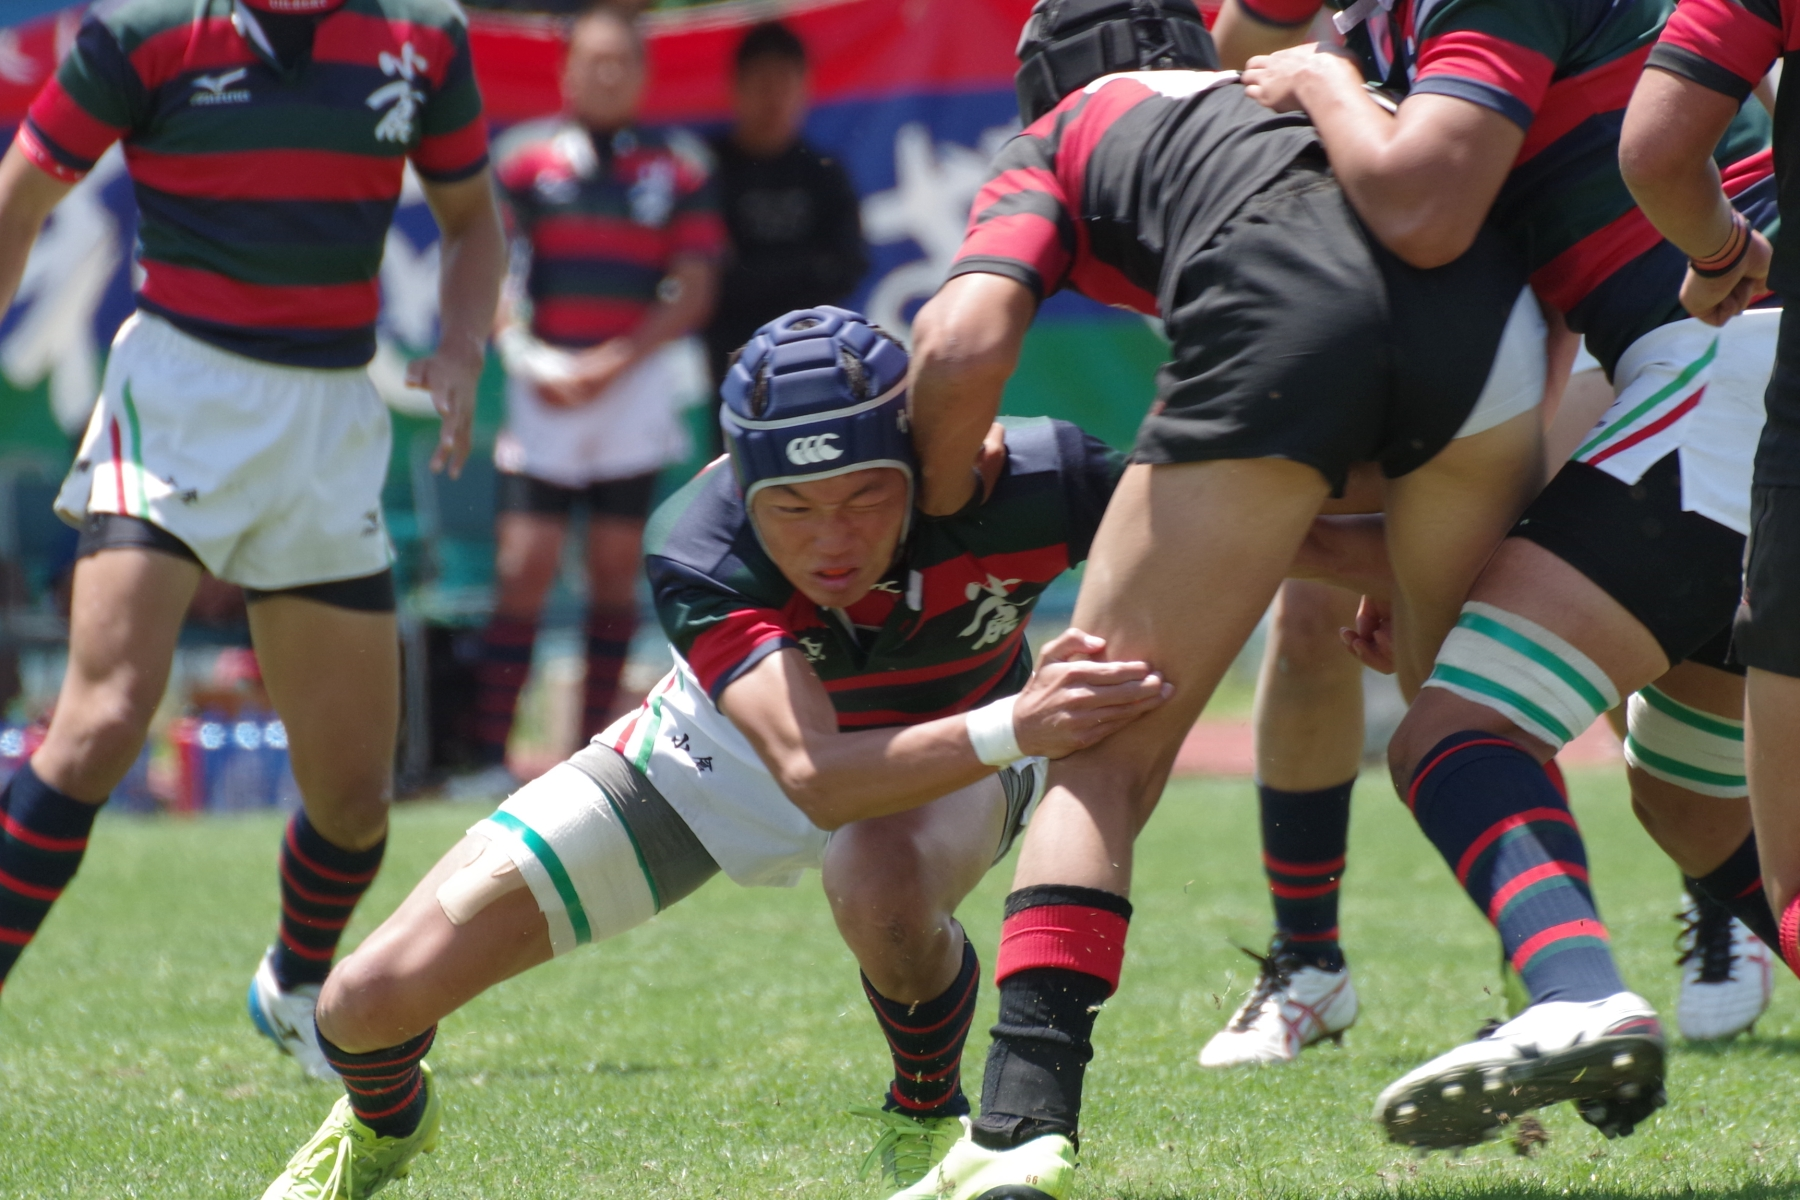 http://kokura-rugby.sakura.ne.jp/180520_124840_0432.jpg